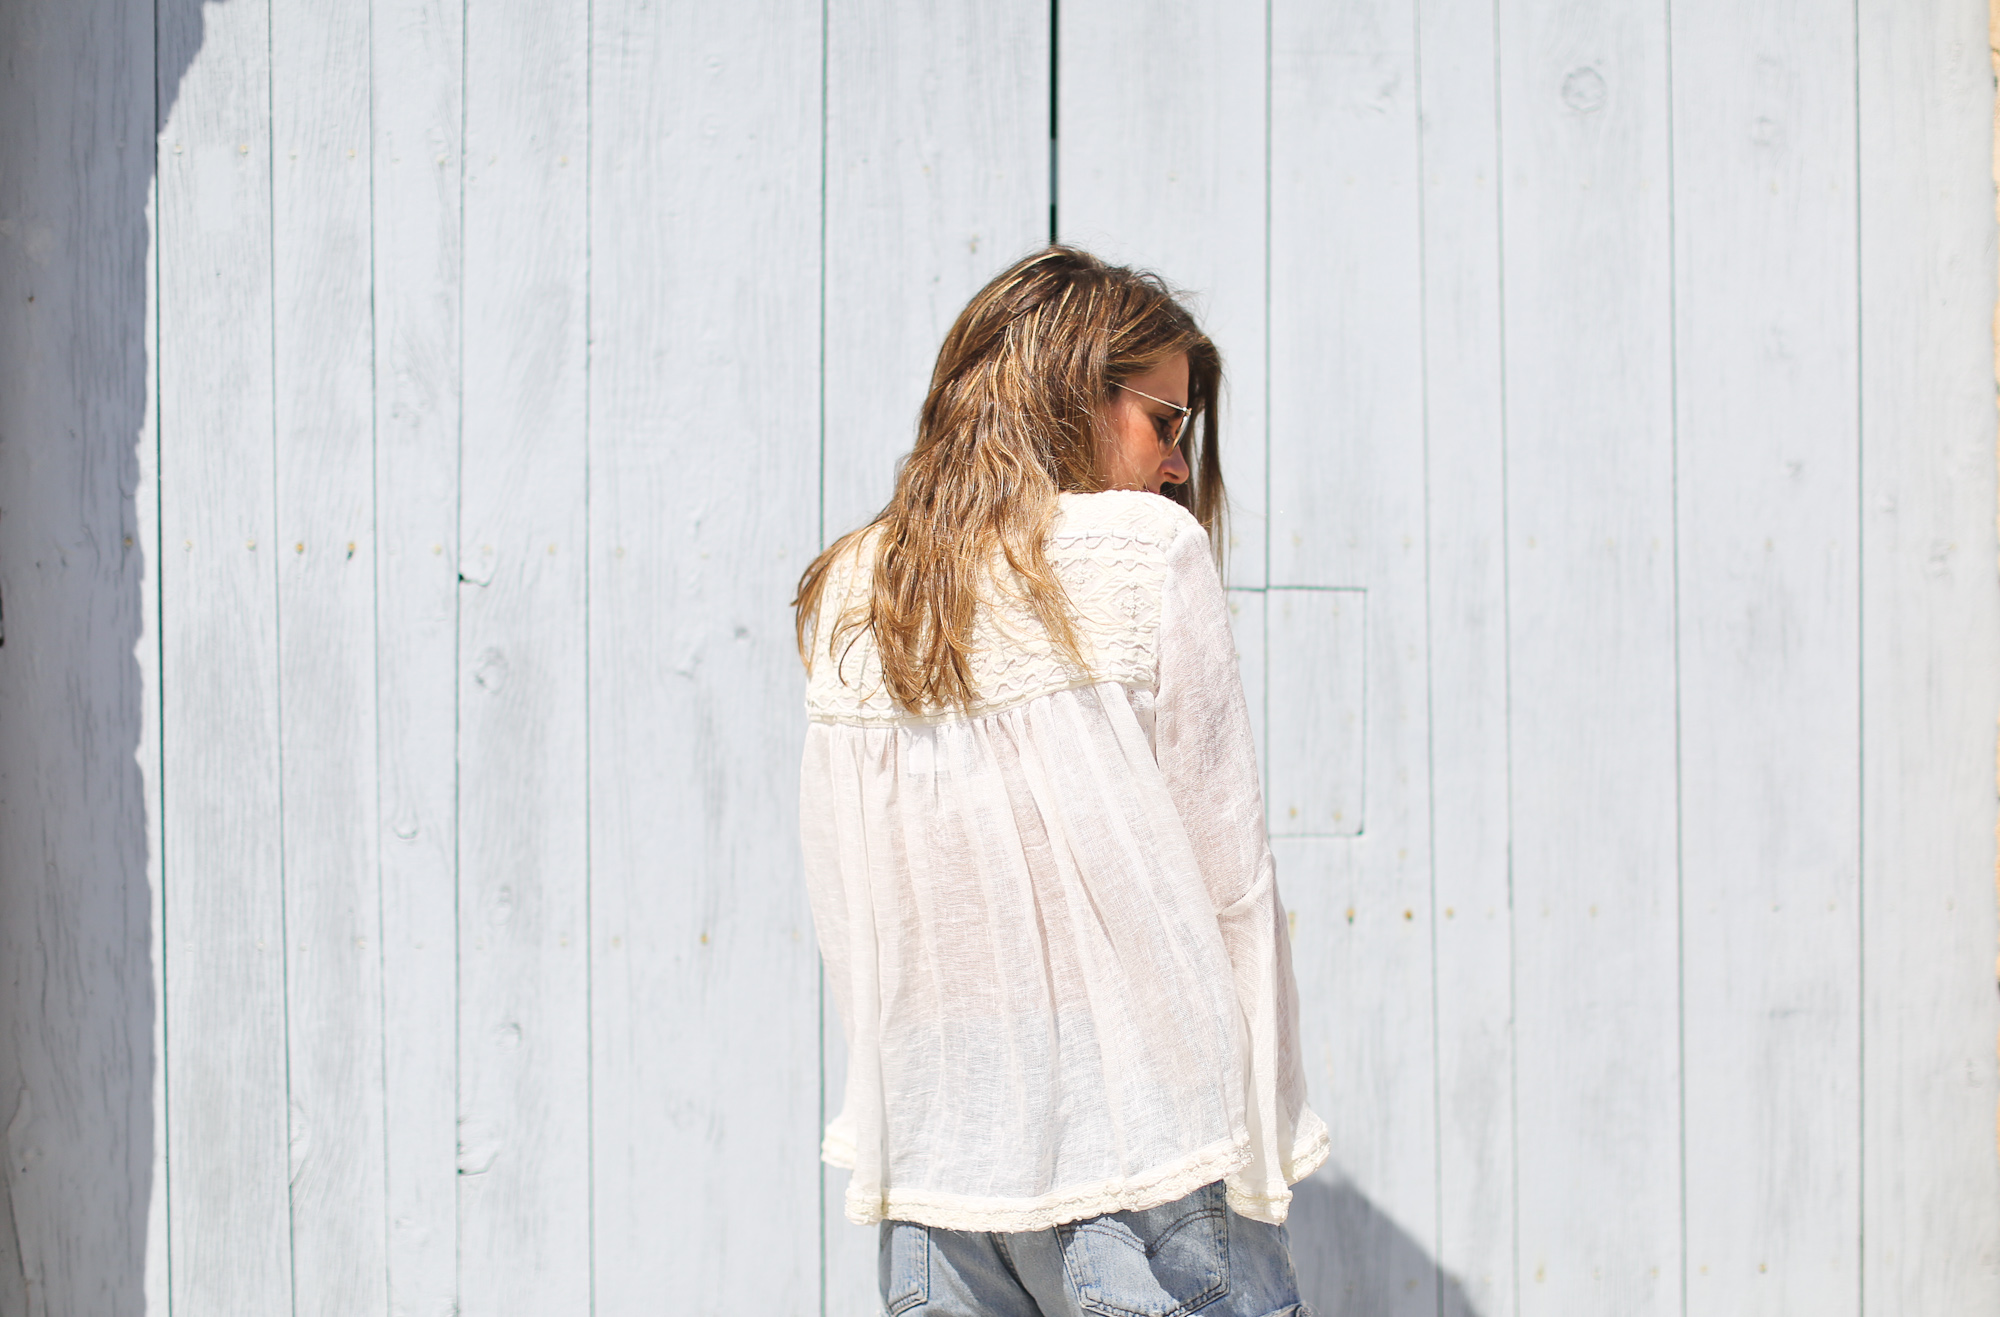 Clochet_streetstyle_zara_embroided_linen_kimonojacket_vintagelevis501shorts-6